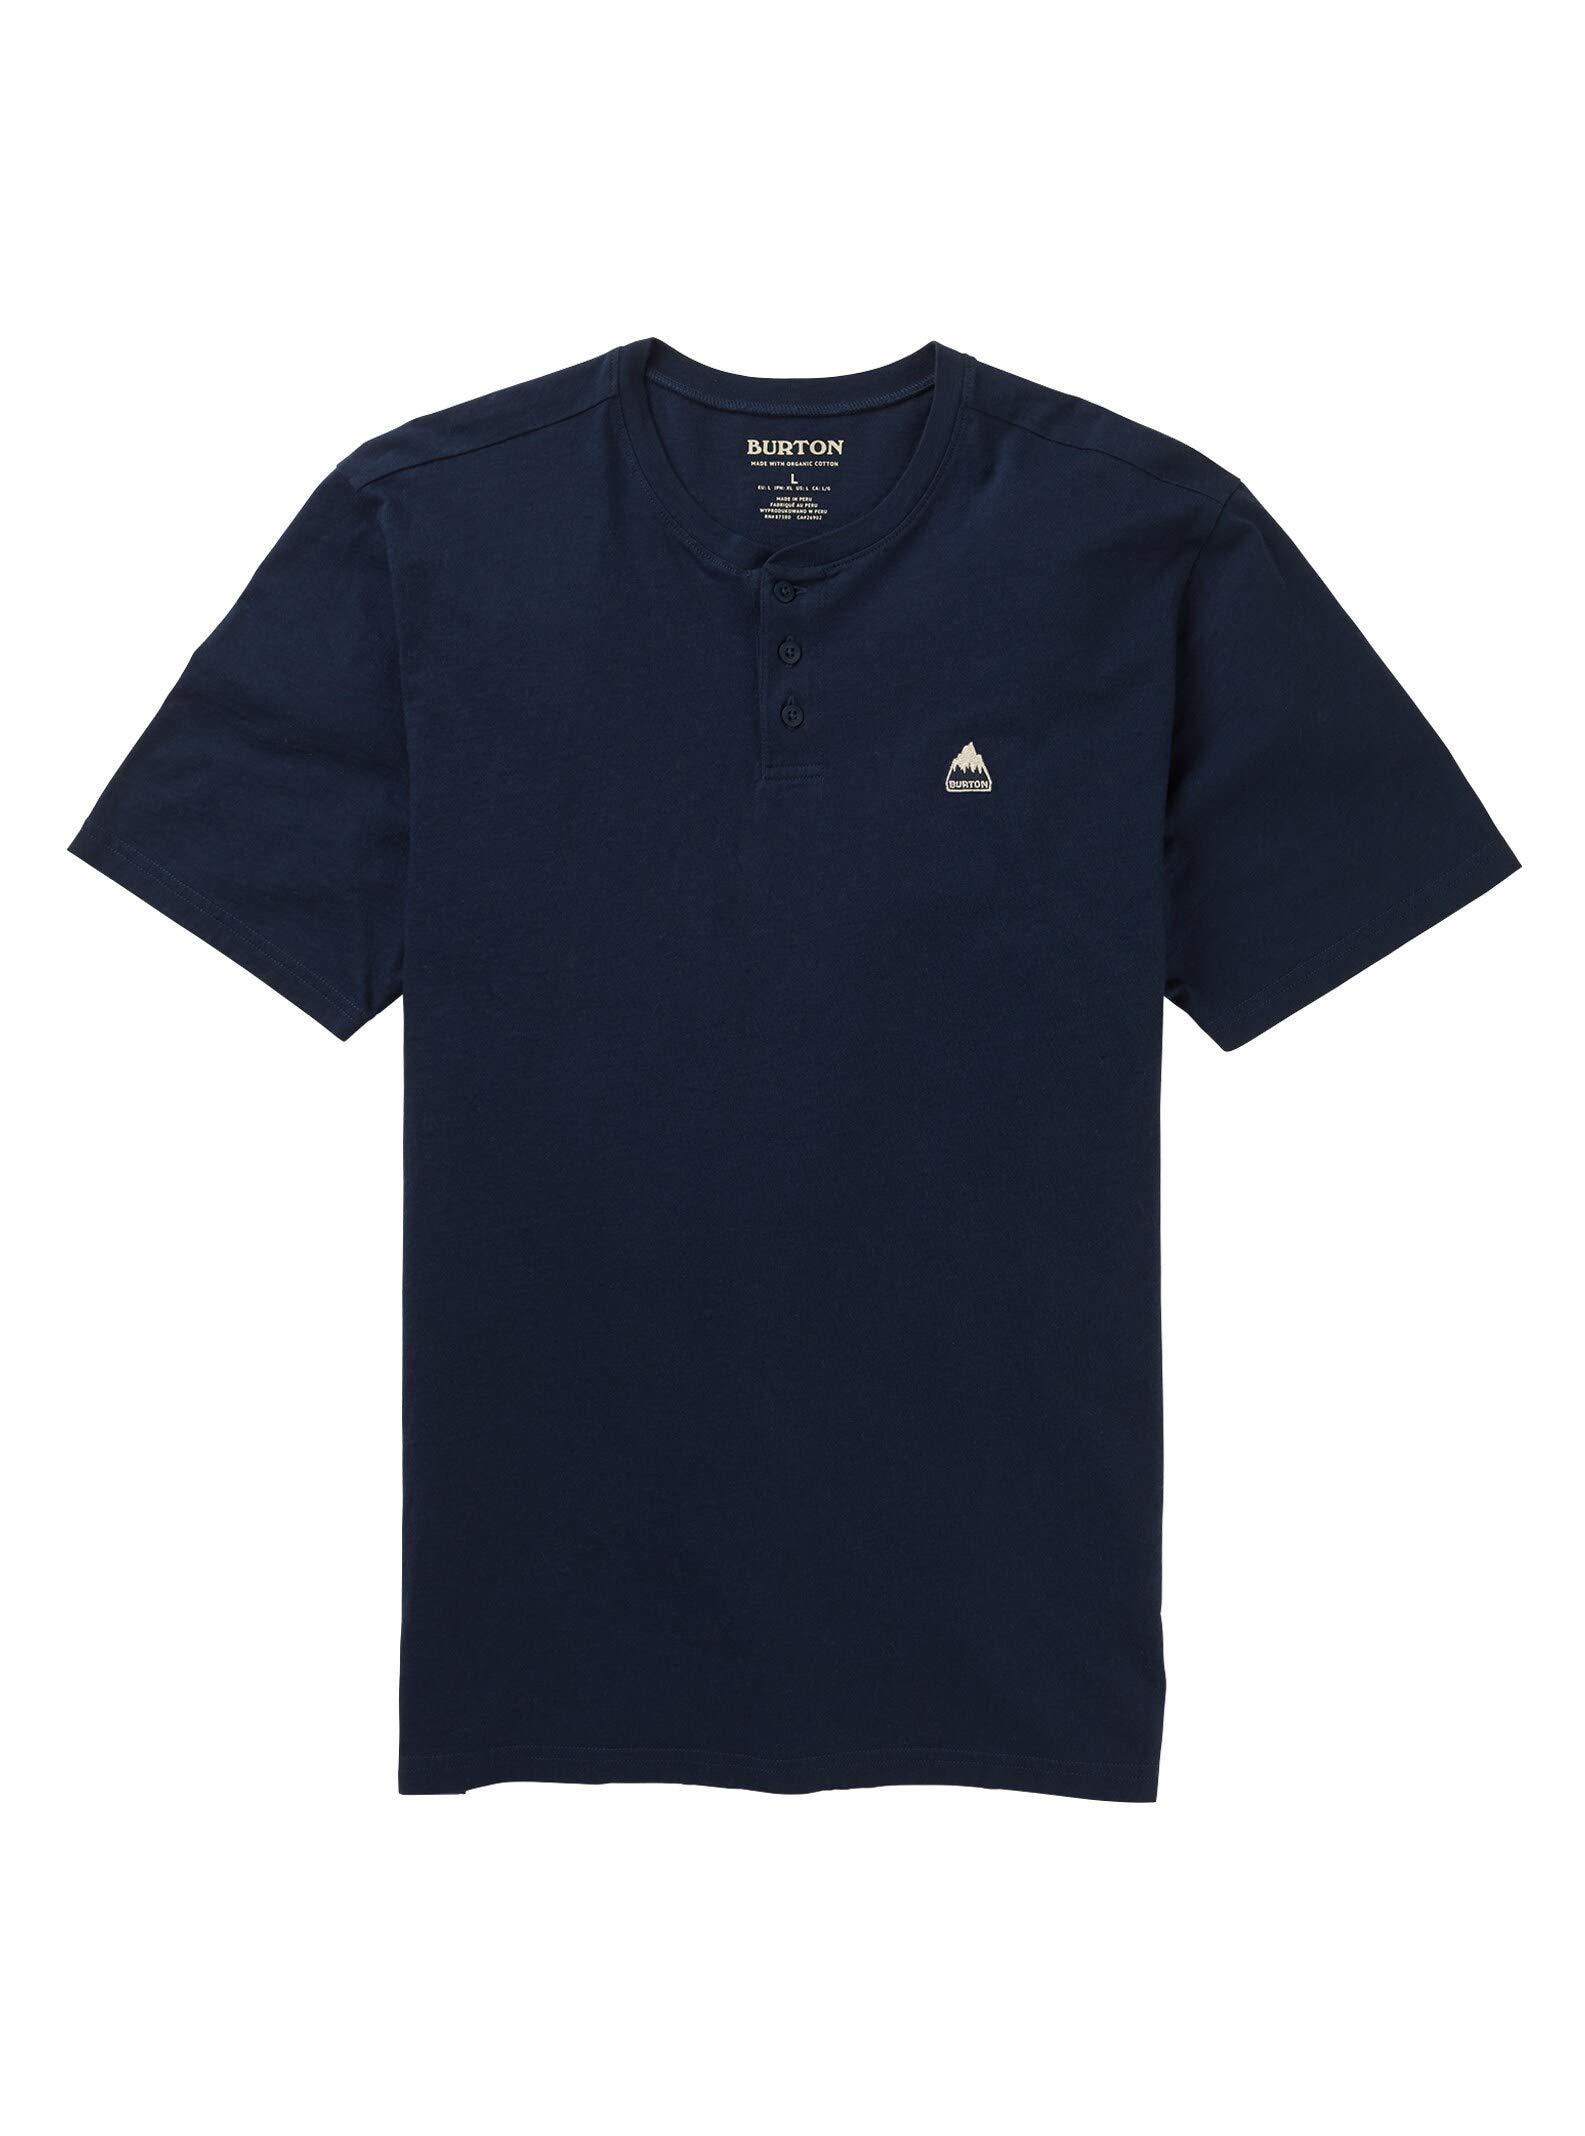 Burton Men's Skreehaven Short Sleeve T-Shirt, Dress Blue, Large